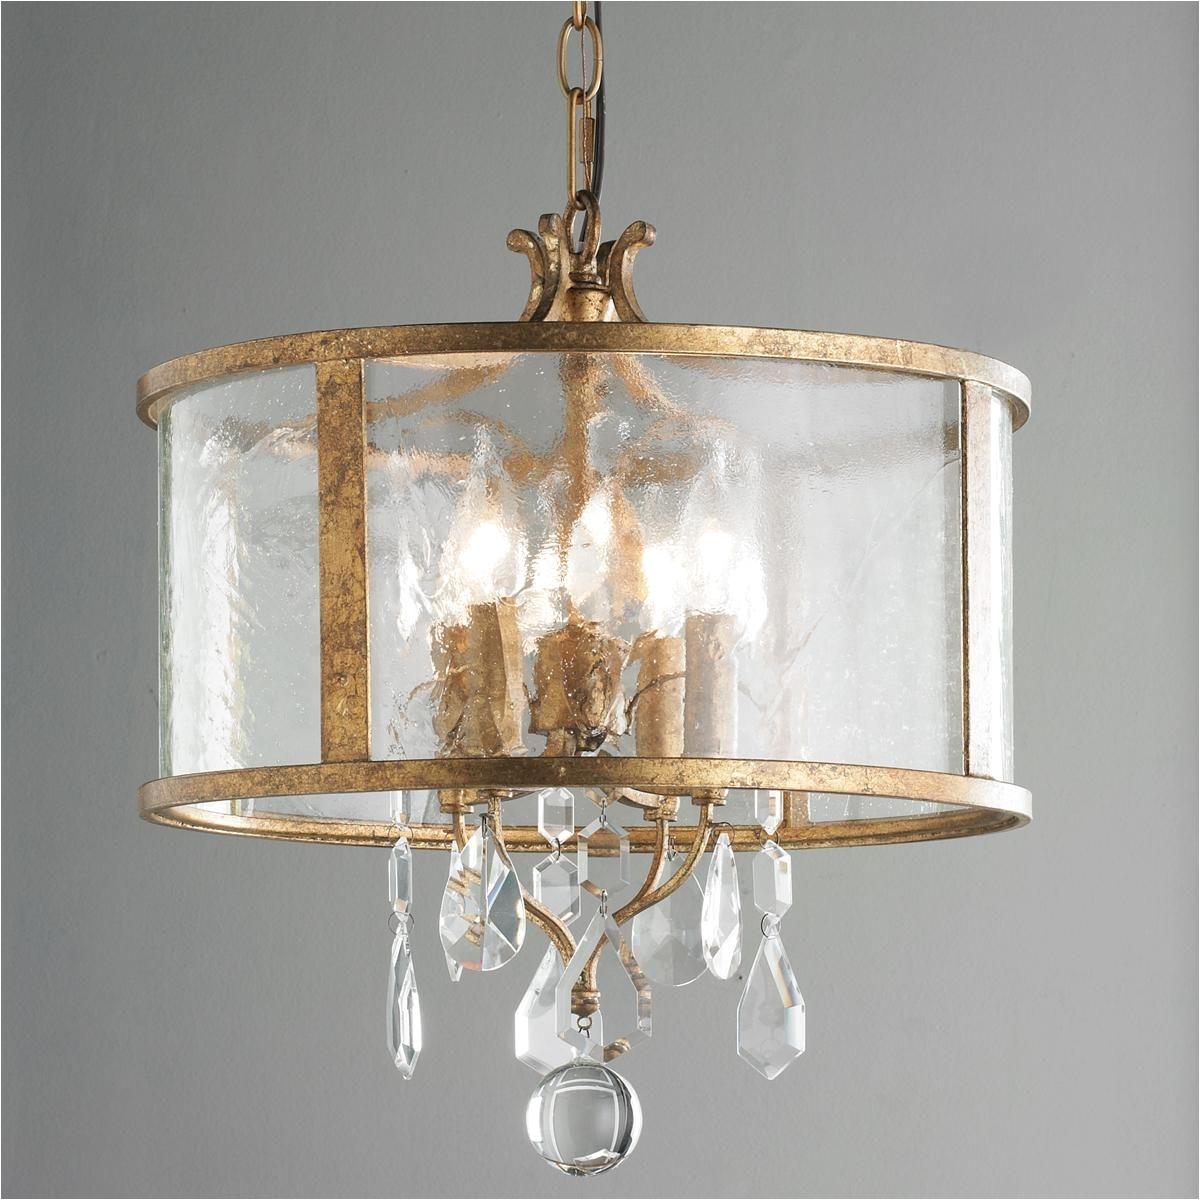 Quatrefoil Light Fixture 57 Best New Lighting Images On Pinterest Bulb Bulbs and Ceiling Lamps